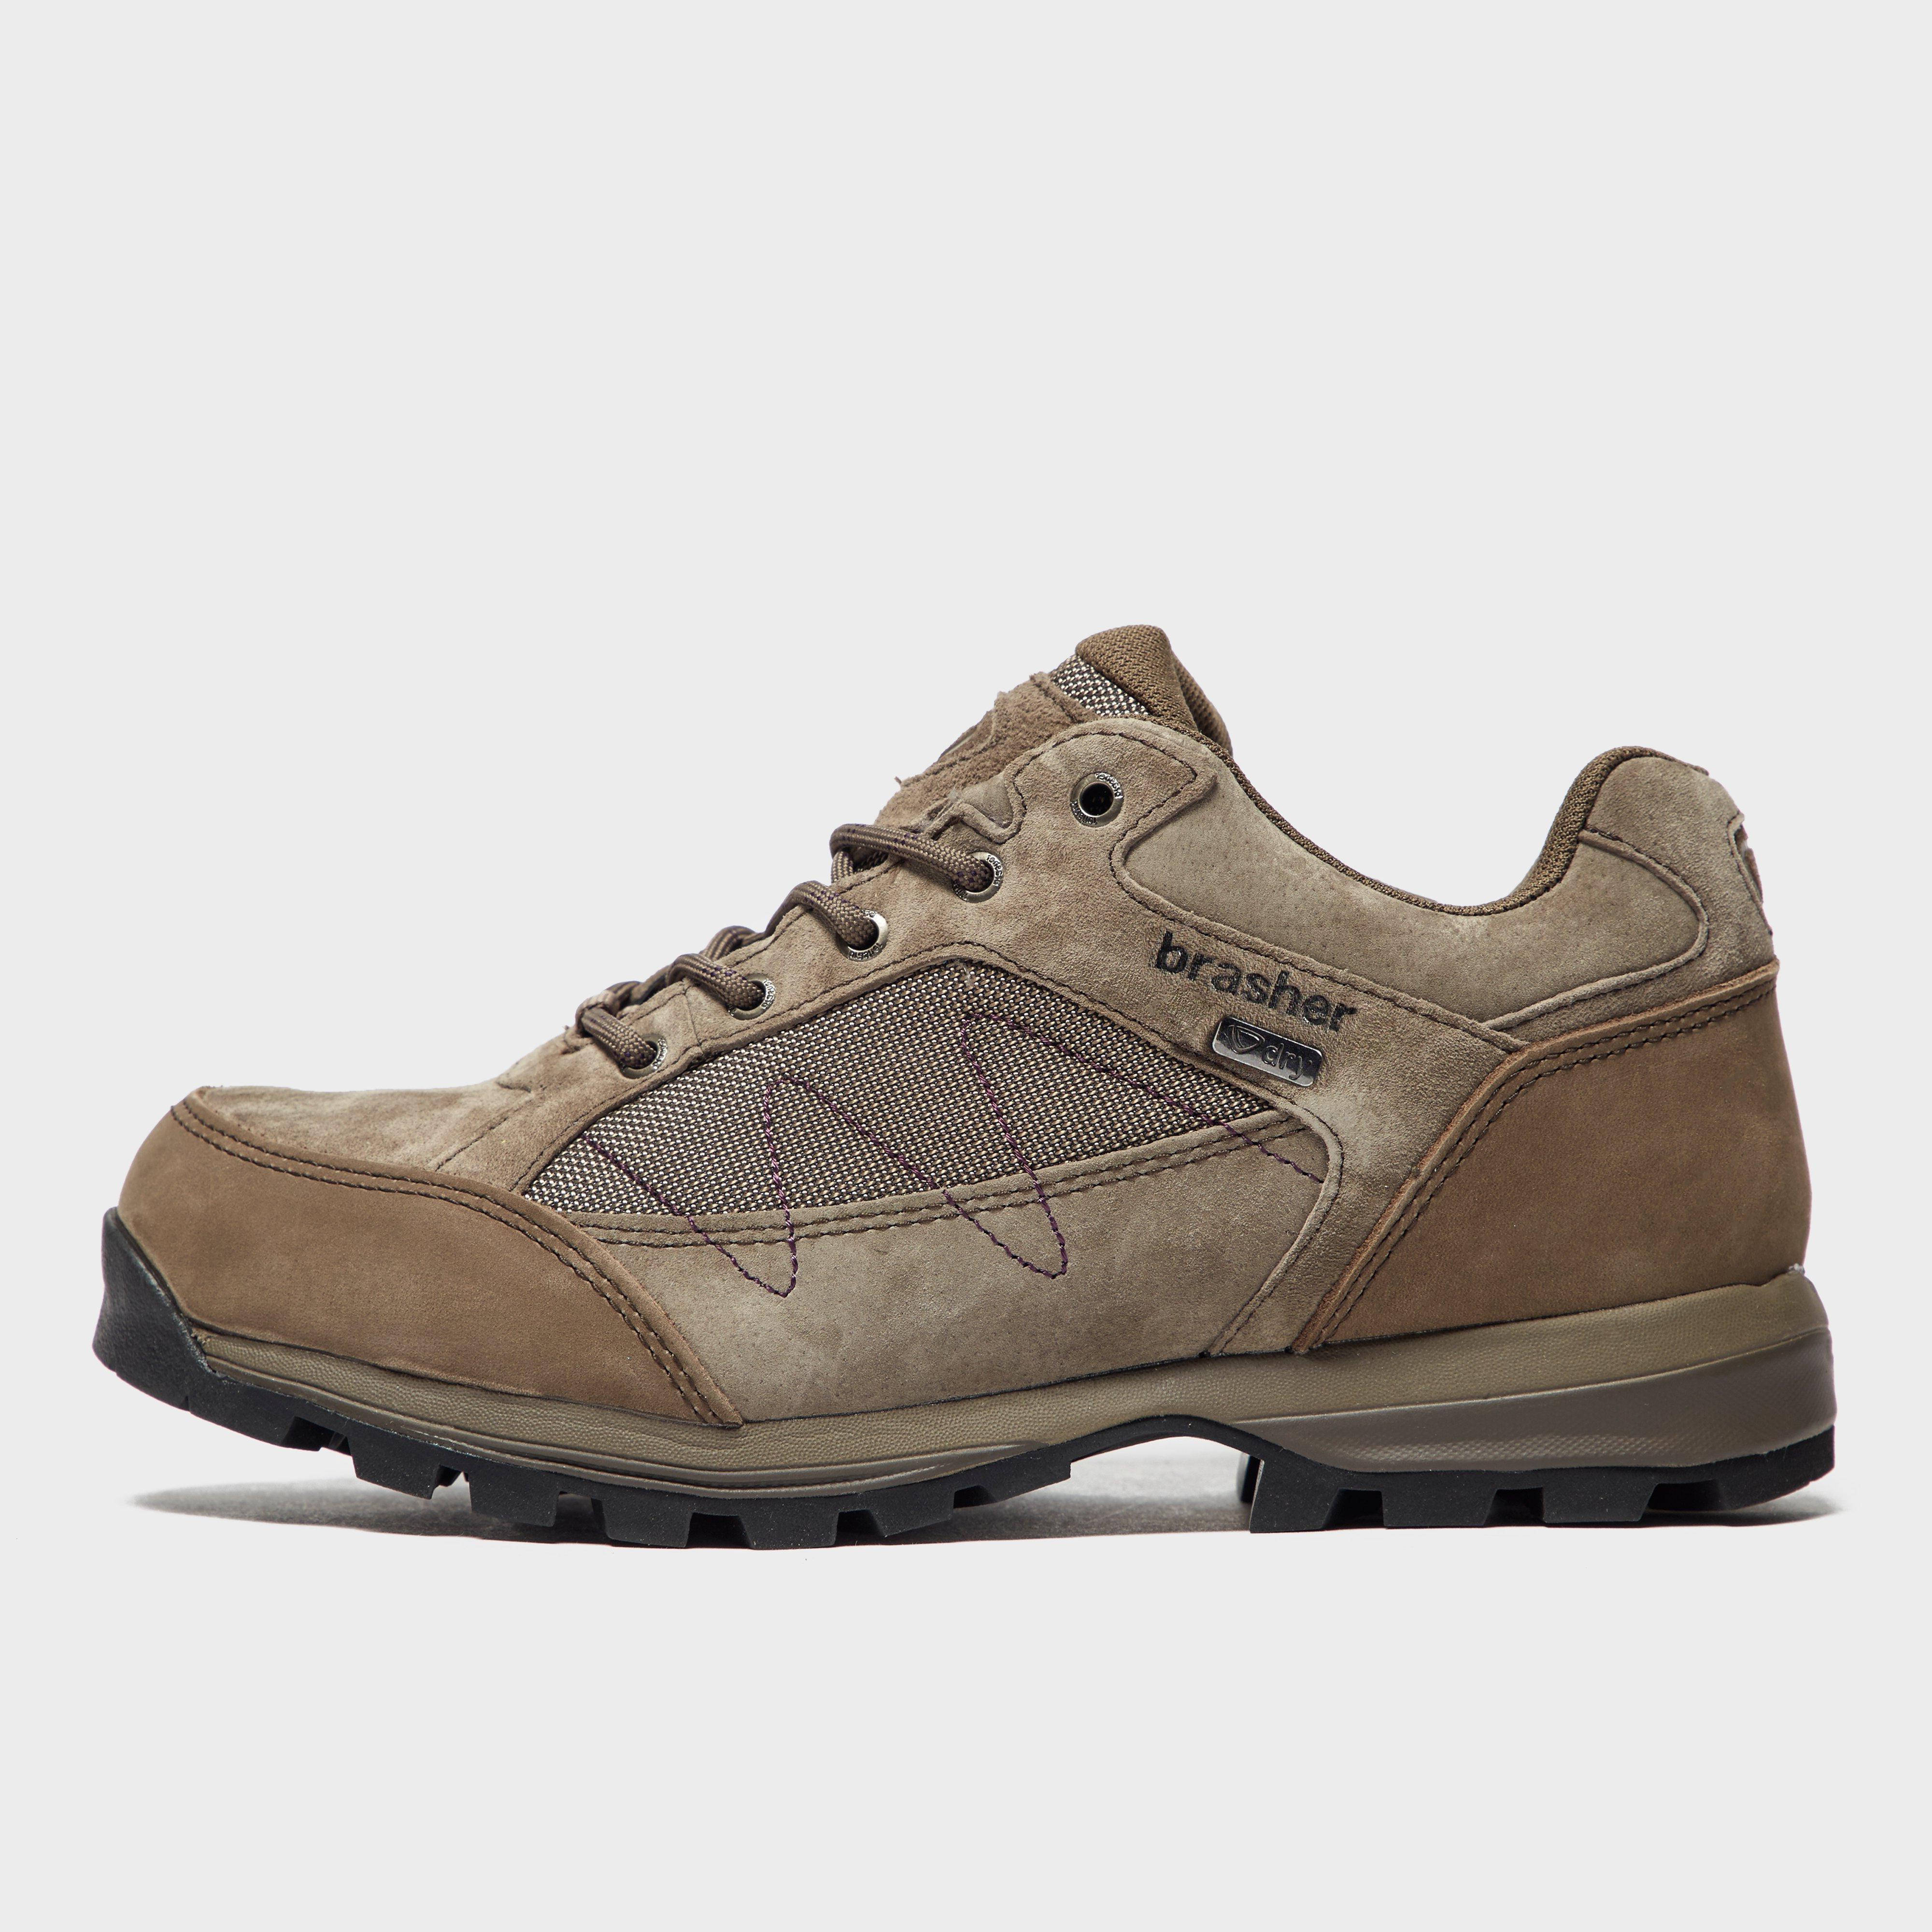 Brasher Brasher Womens Country Hiker Walking Shoes - Brown, Brown